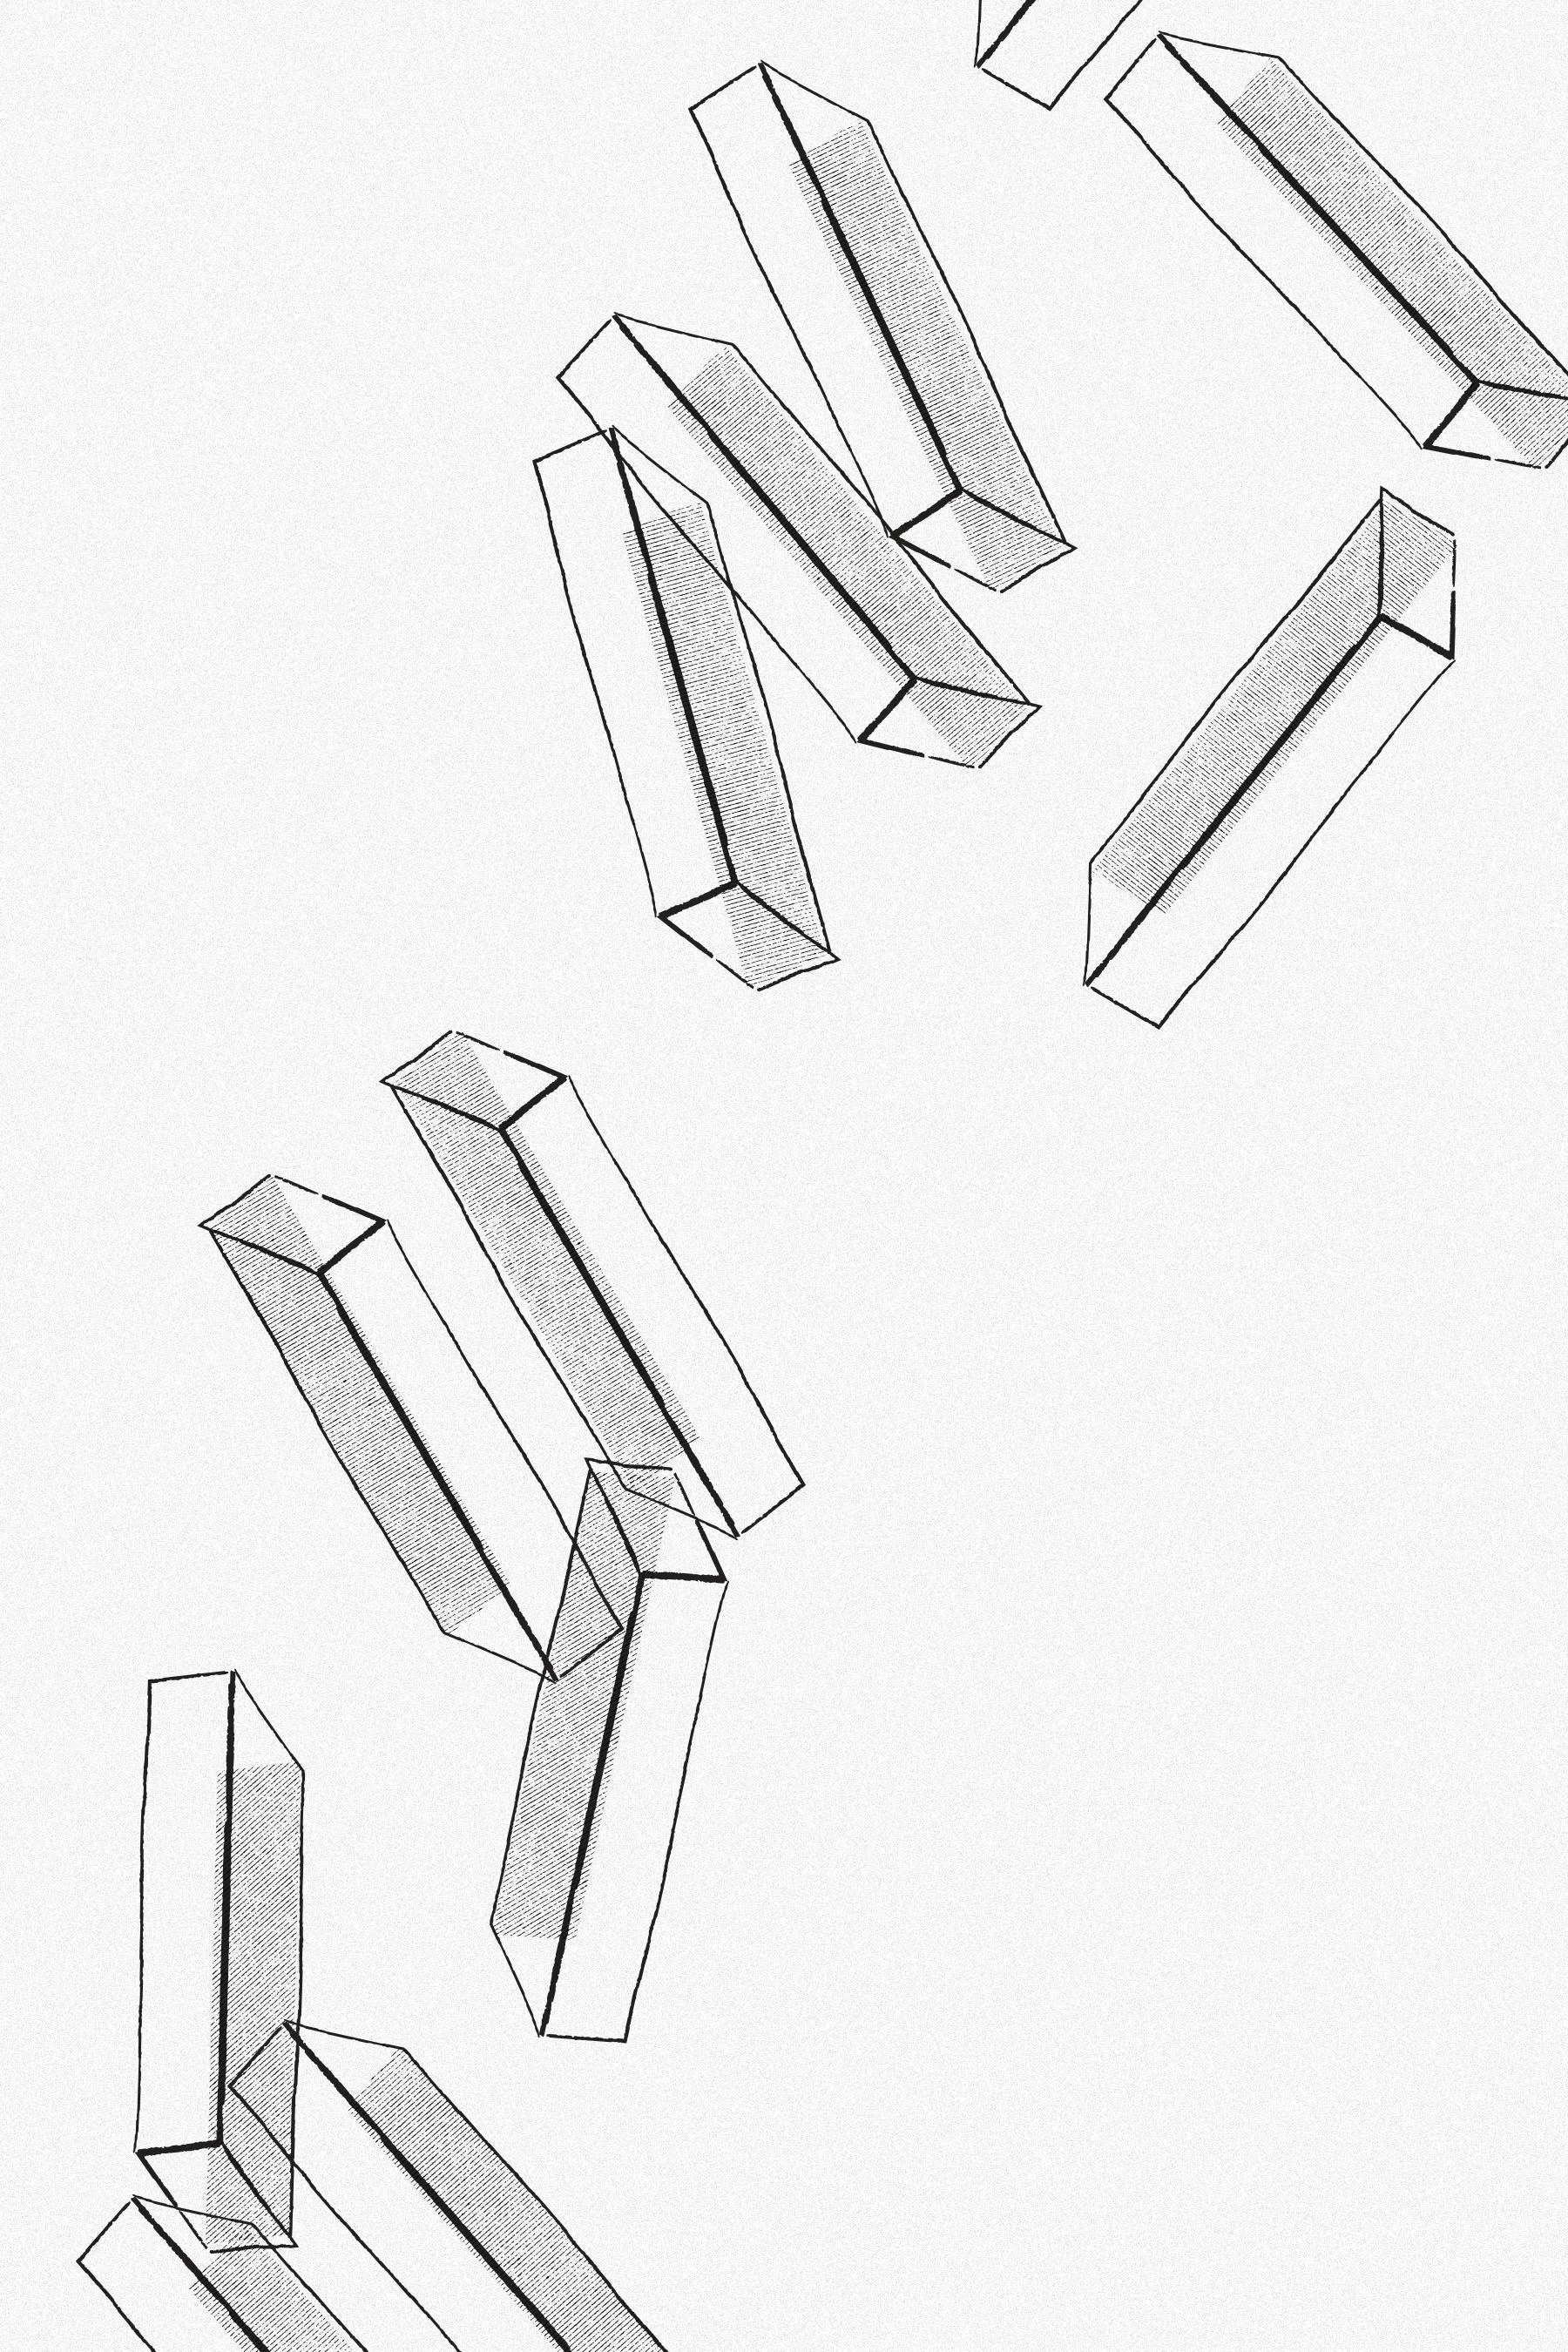 Abstract illustration.